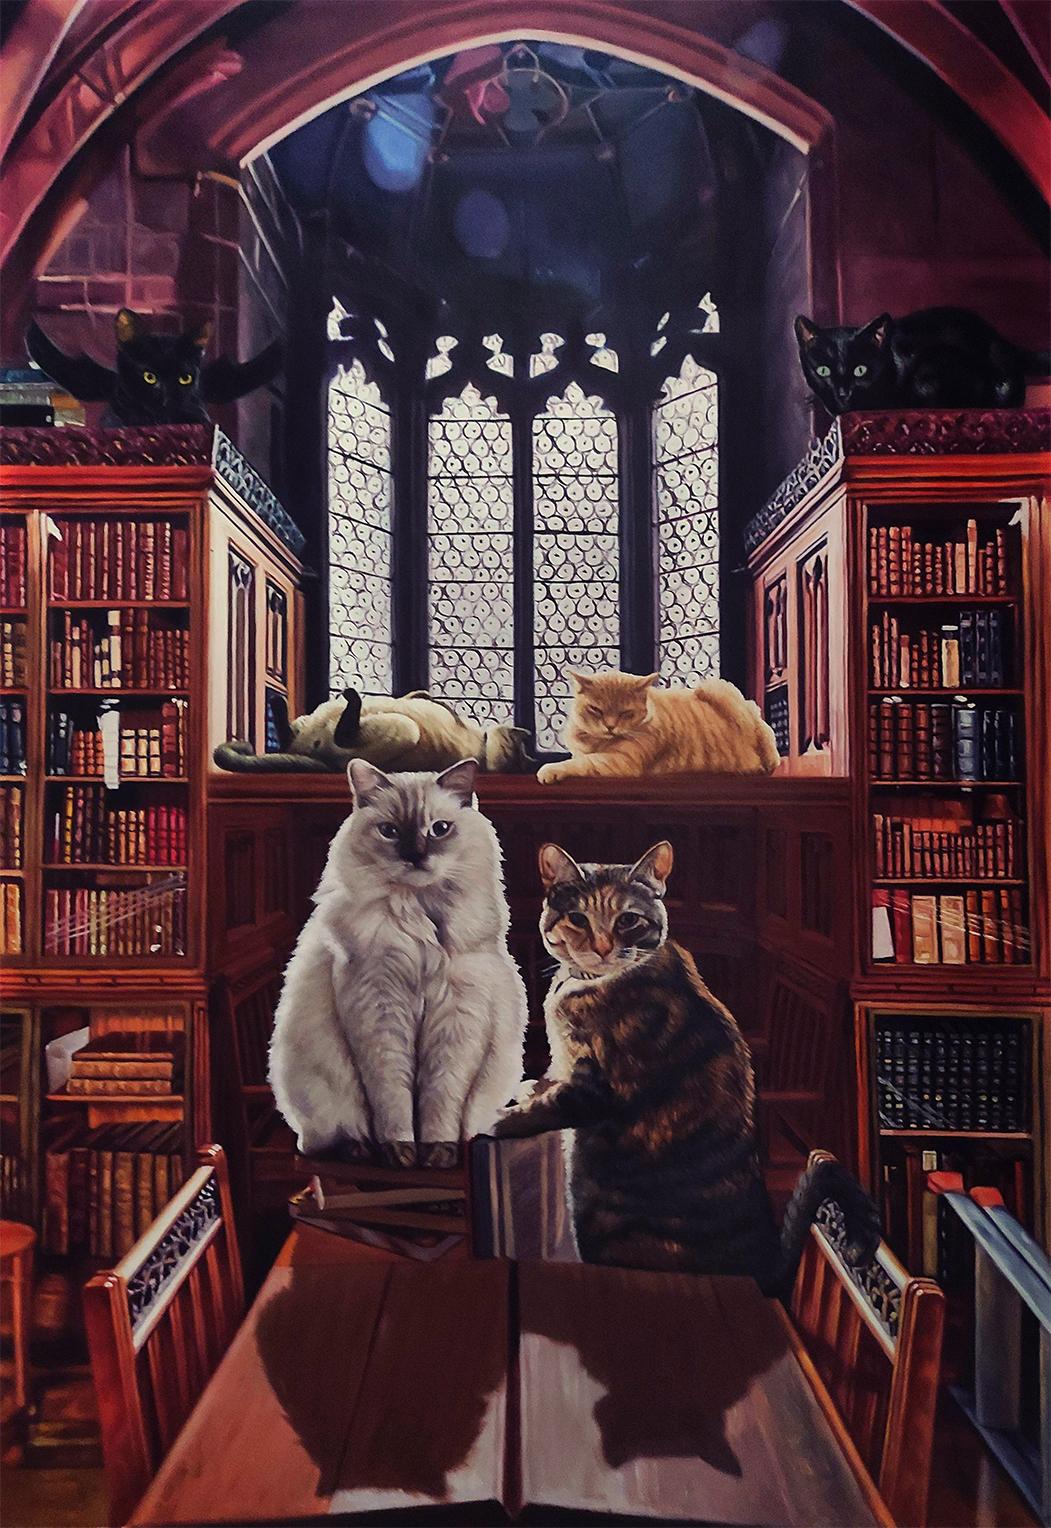 cat in hogwarts library artwork